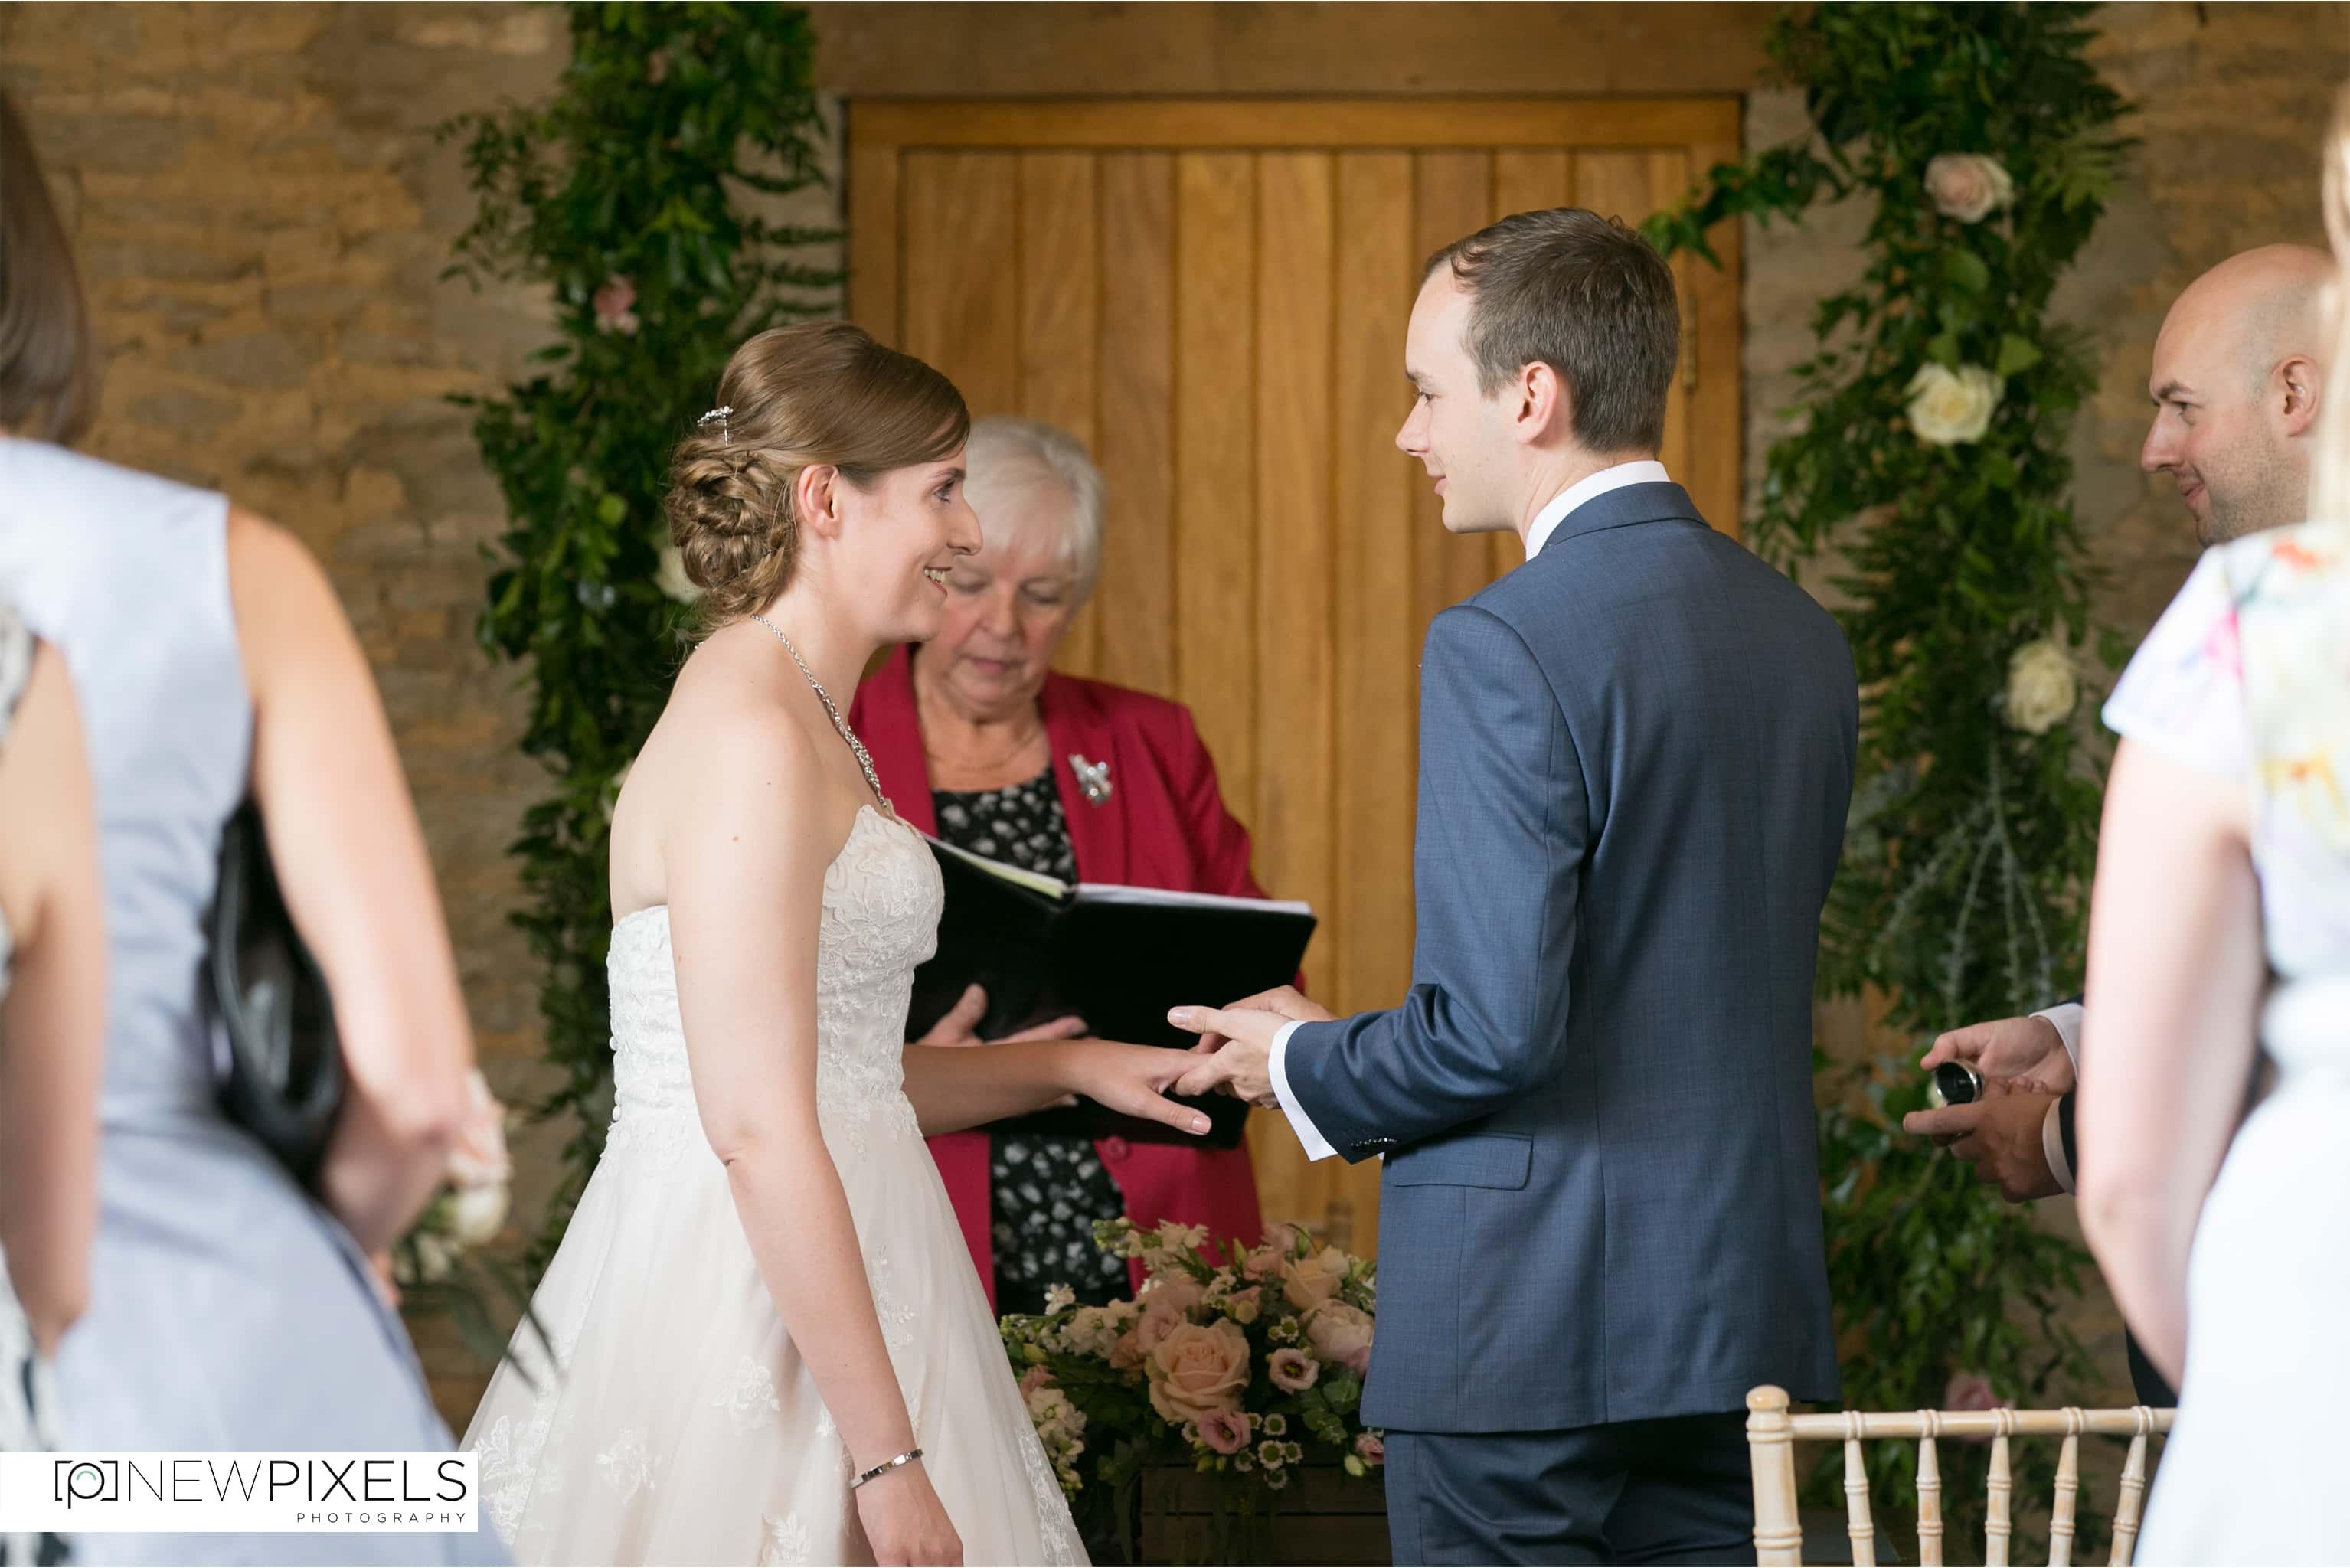 Hertfordshire Wedding Photography- New Pixels107